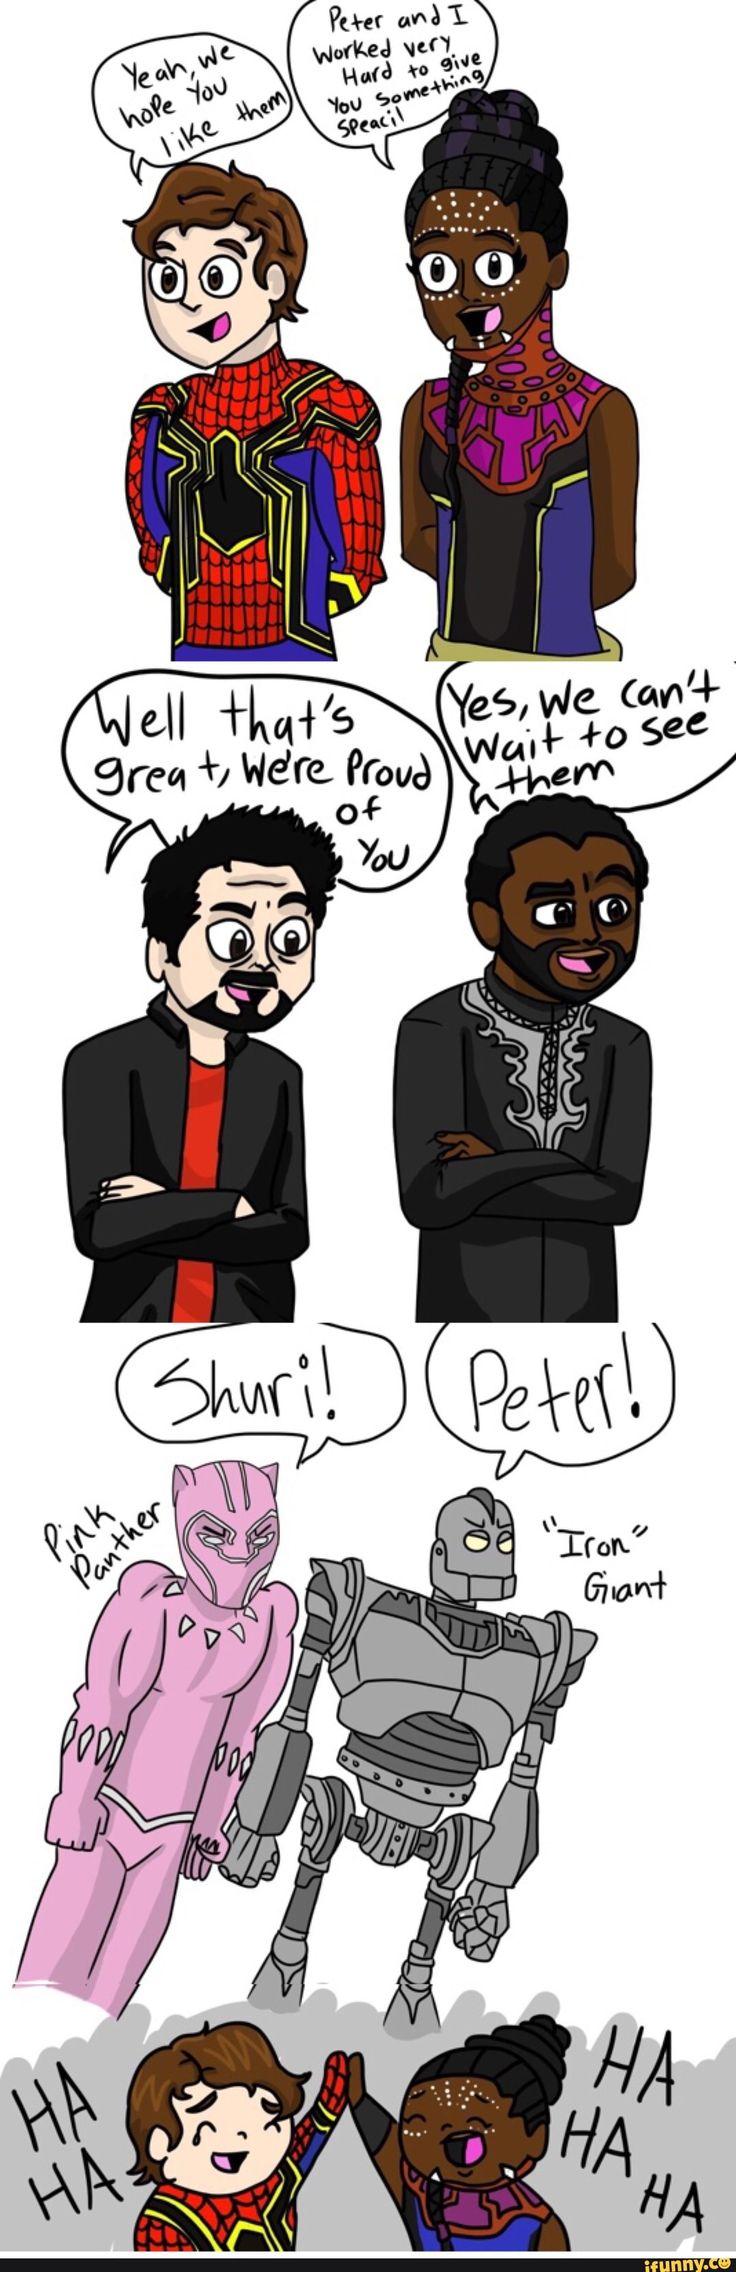 #peterparker, #blackpanther, #shuri, #spiderman, #ironman